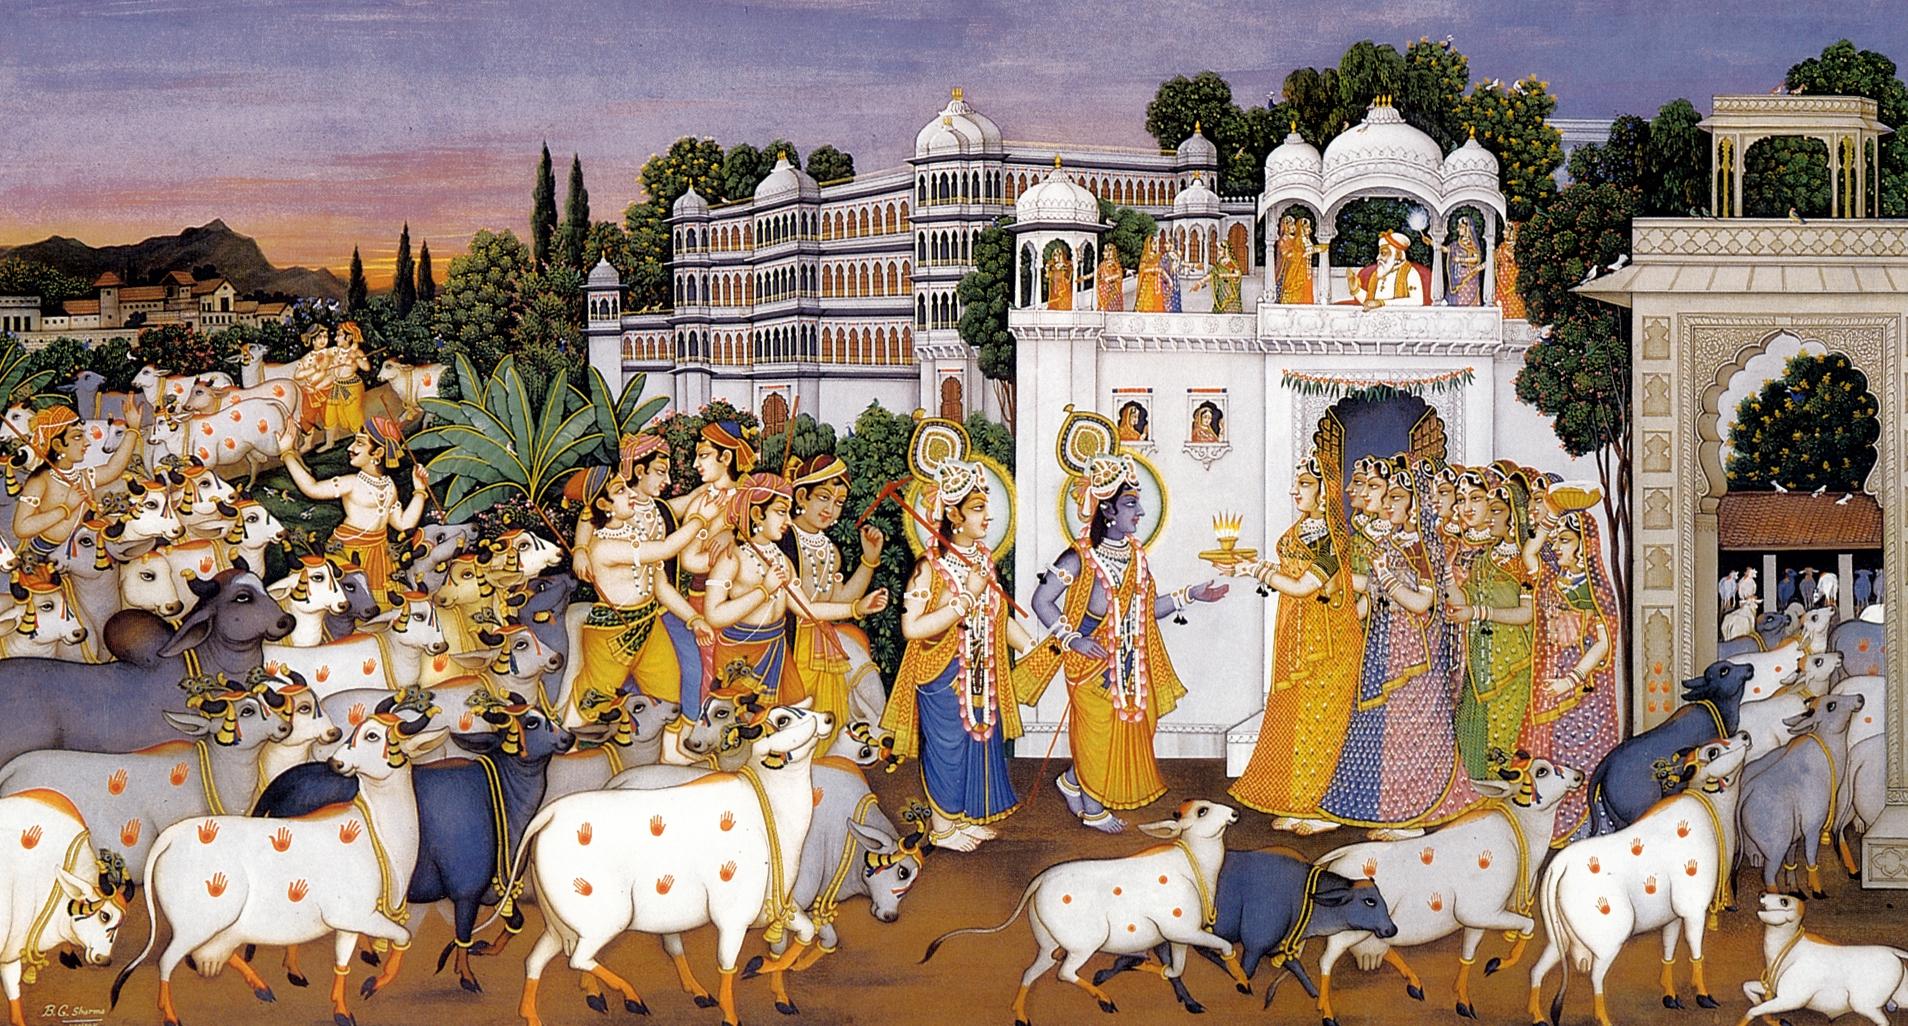 Best Radha Krishna Hd Wallpaper February 2014 The Hare Krishna Movement